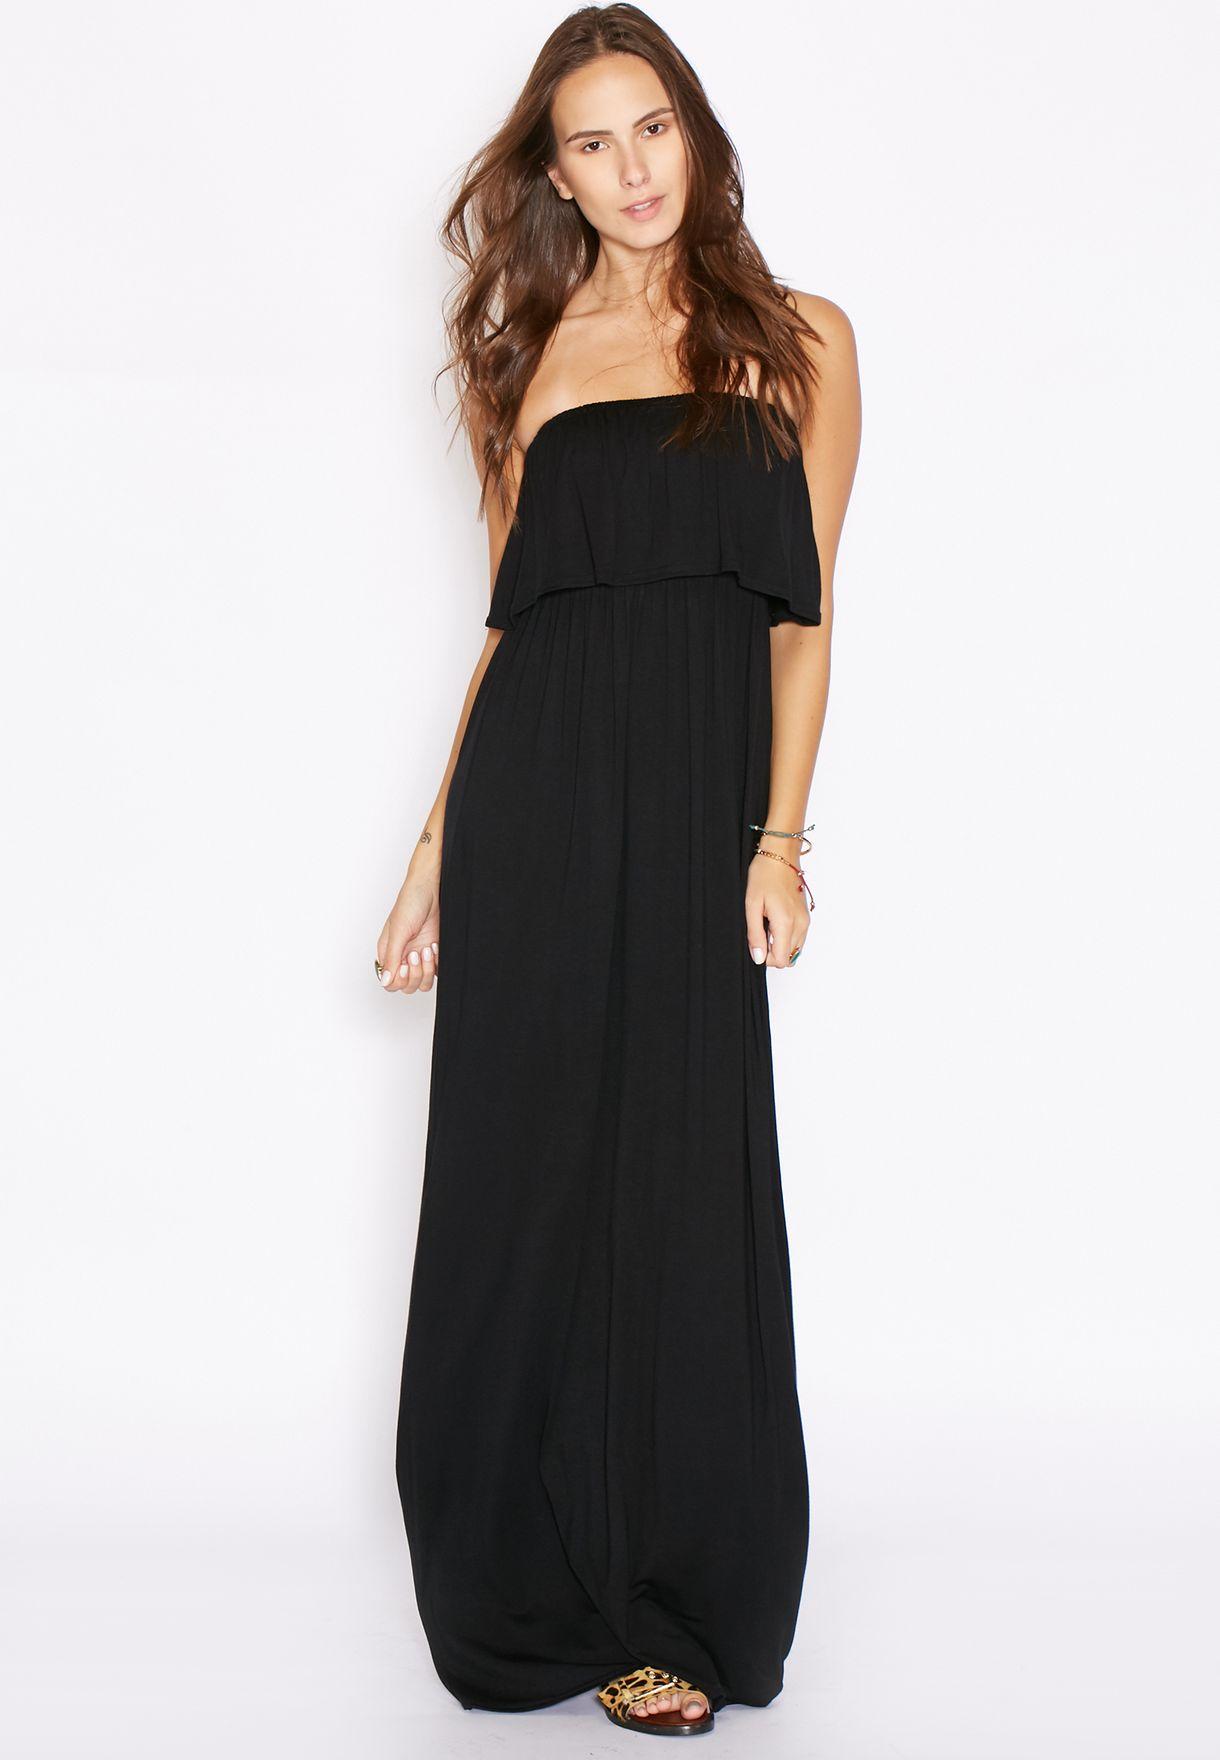 d9f1c7f969f Shop Ginger Basics black Ruffle Bandeau Maxi Dress for Women in ...